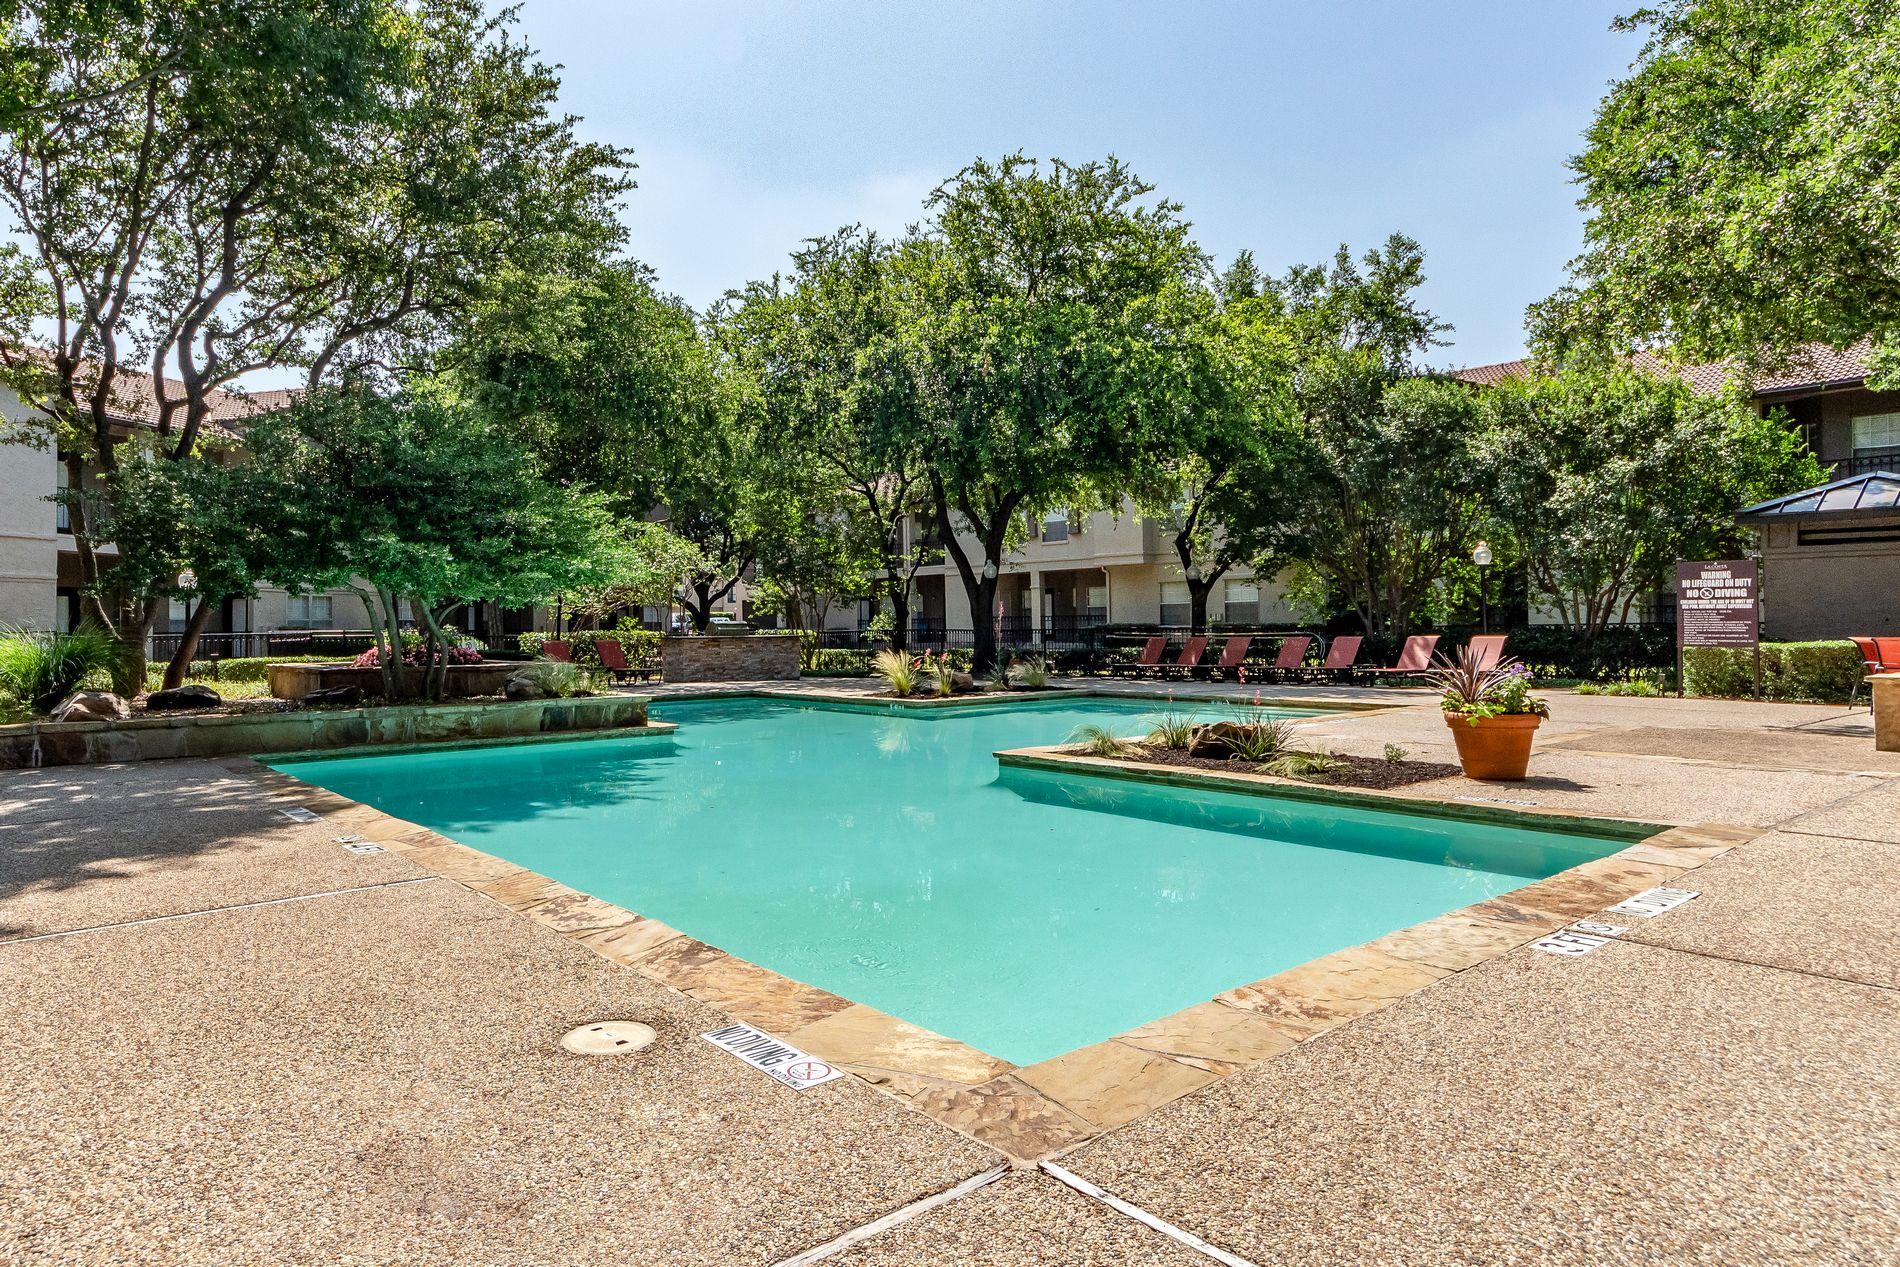 Main Pool at La Costa Apartments in Plano, Texas, TX